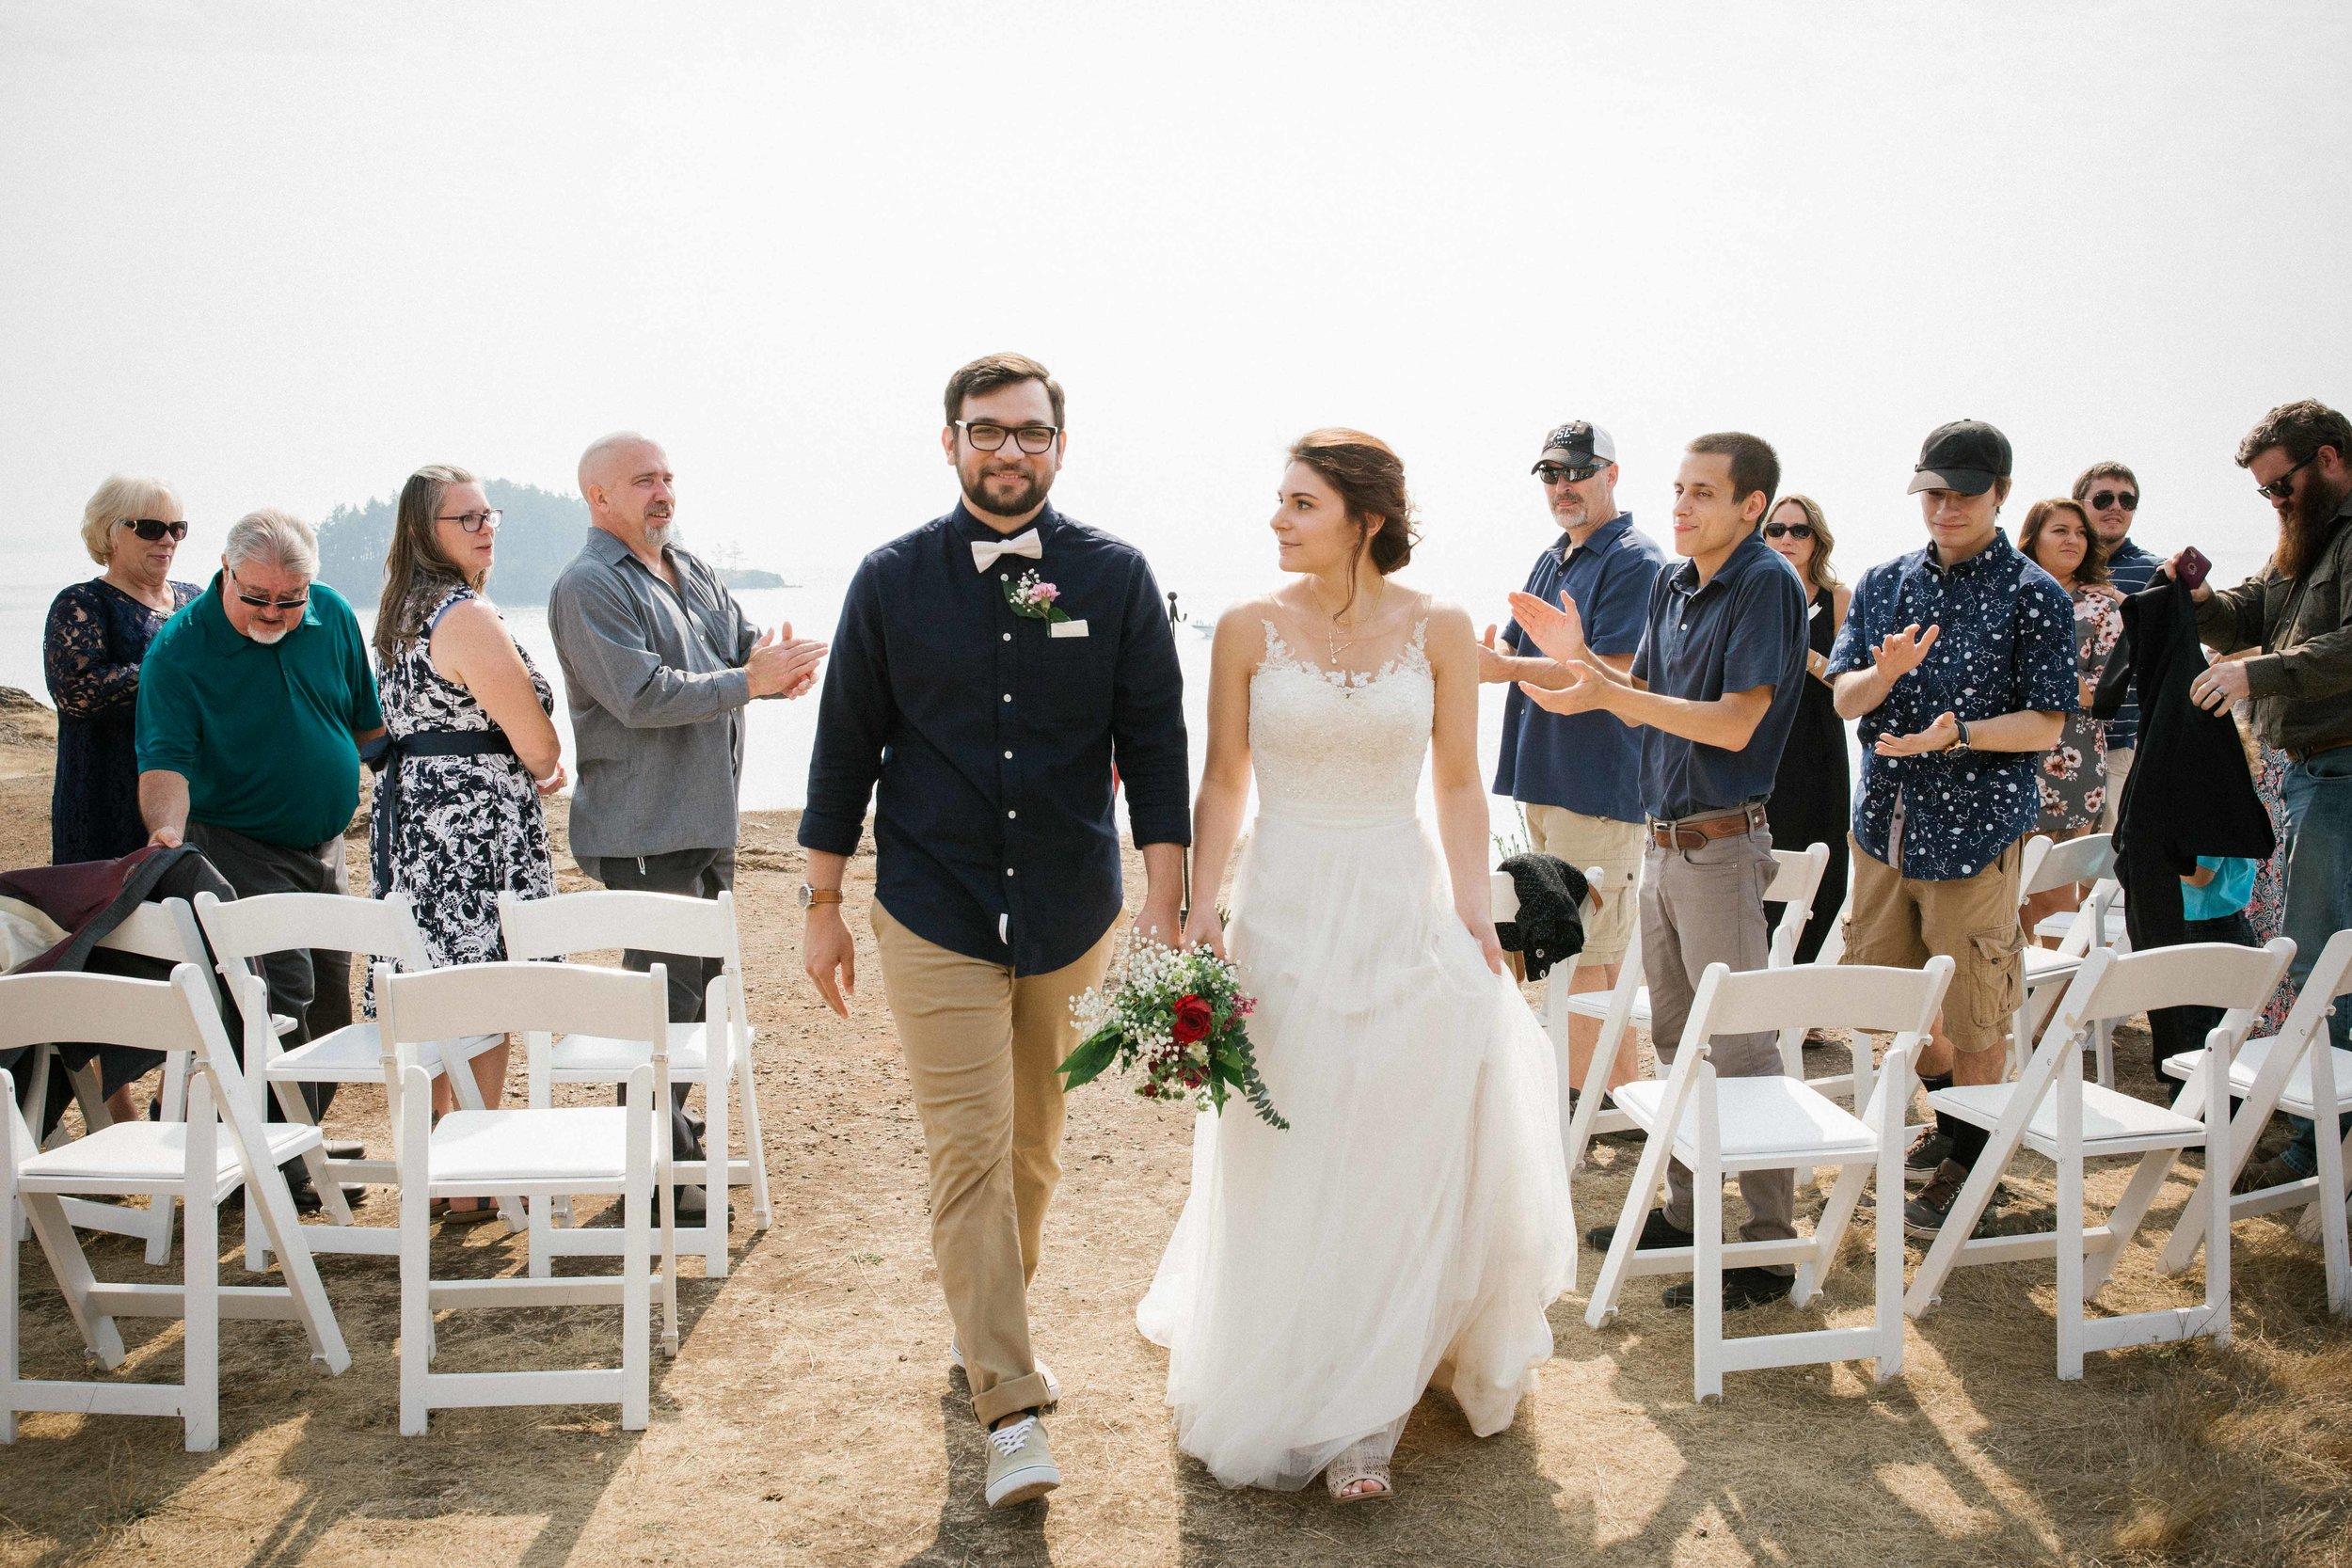 deception-pass-wedding-35.jpg